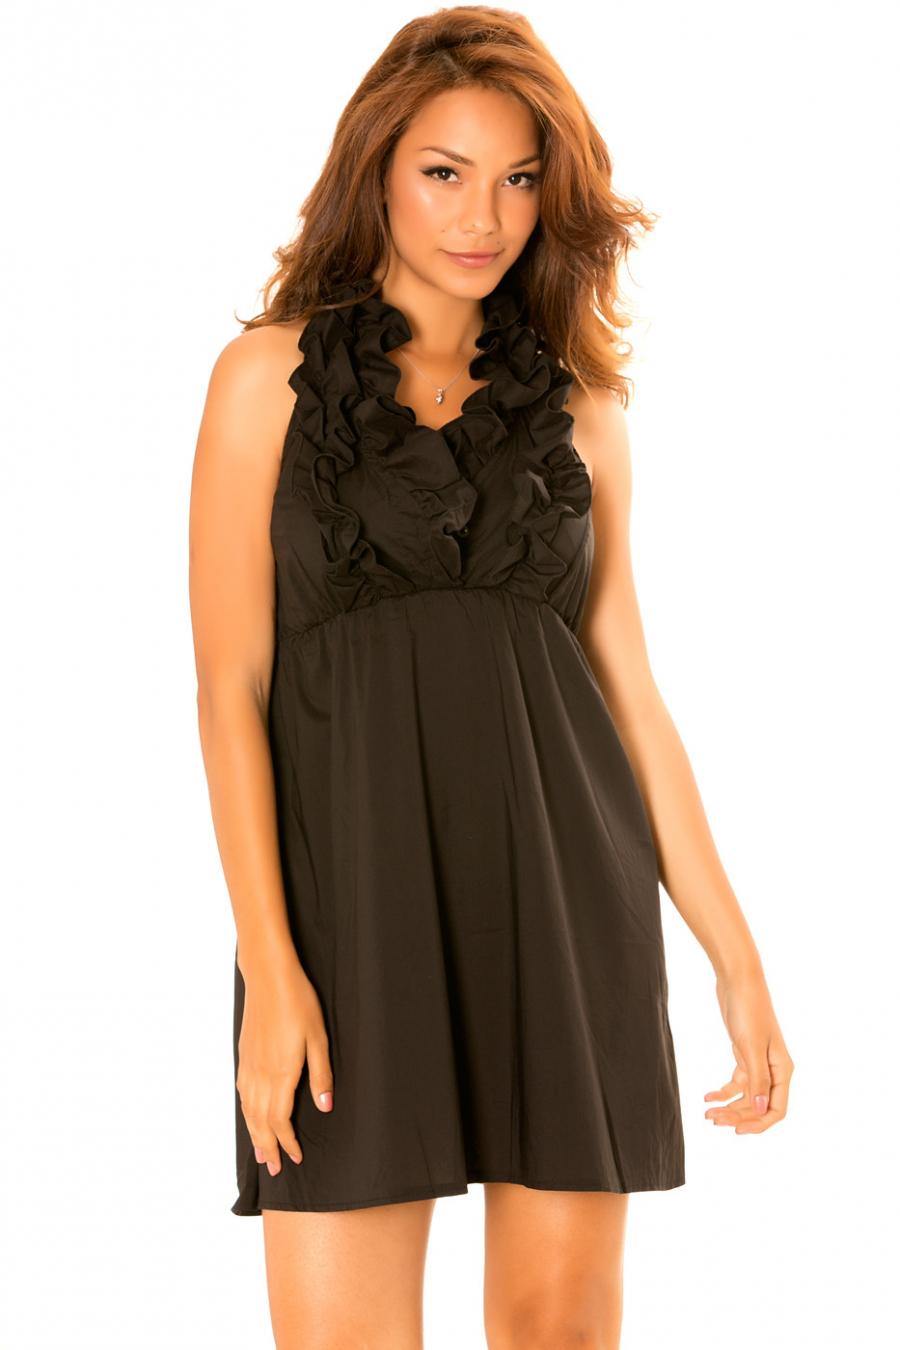 Zwarte jurk met ruches kraag en open rug. Trendy jurk. 930